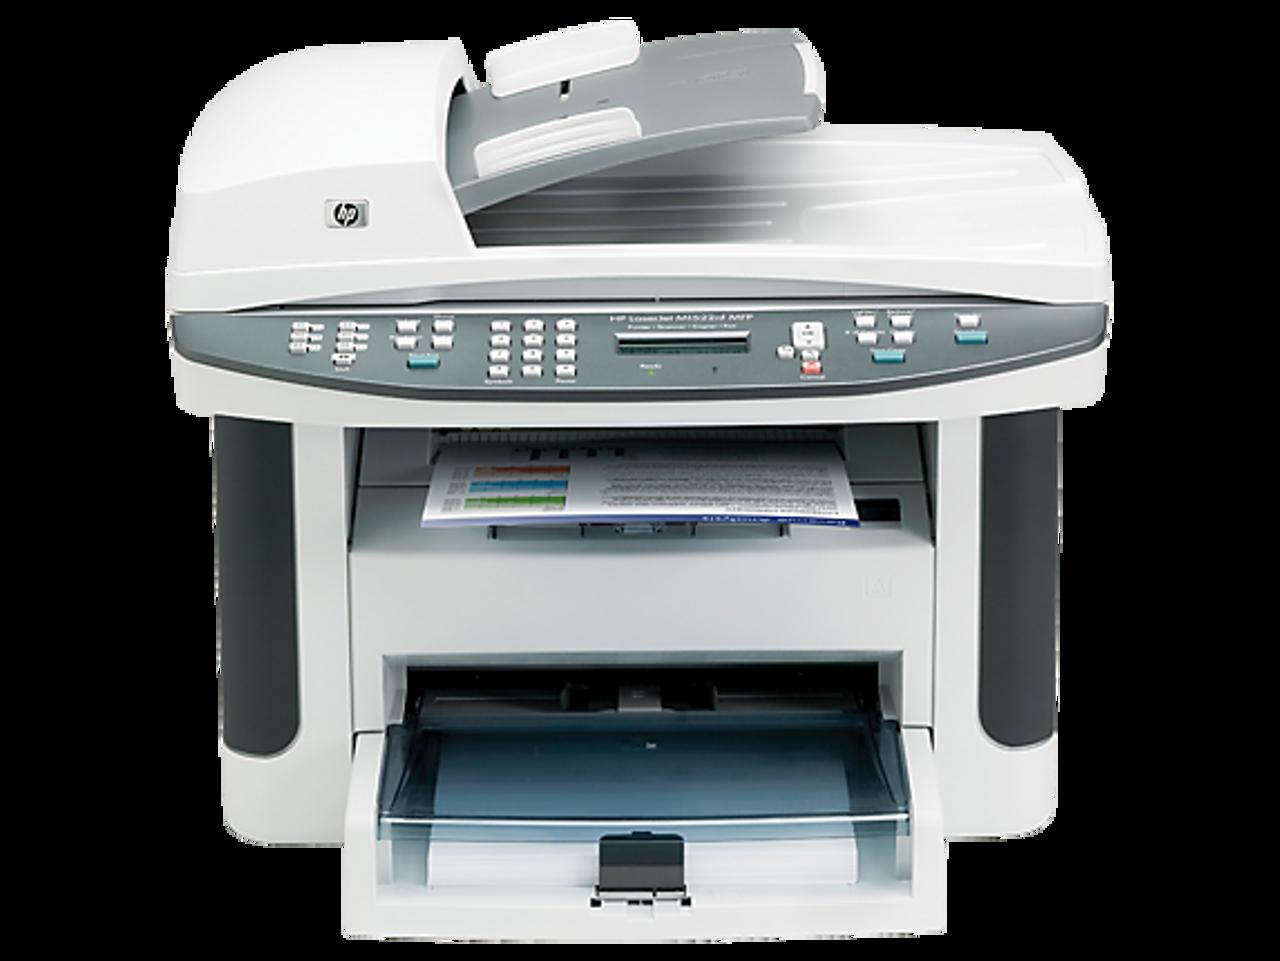 HP LaserJet 3052 All-in-One B&W Laser - Printer - copier - scanner (Q6502A) - HP Laser Printer for sale